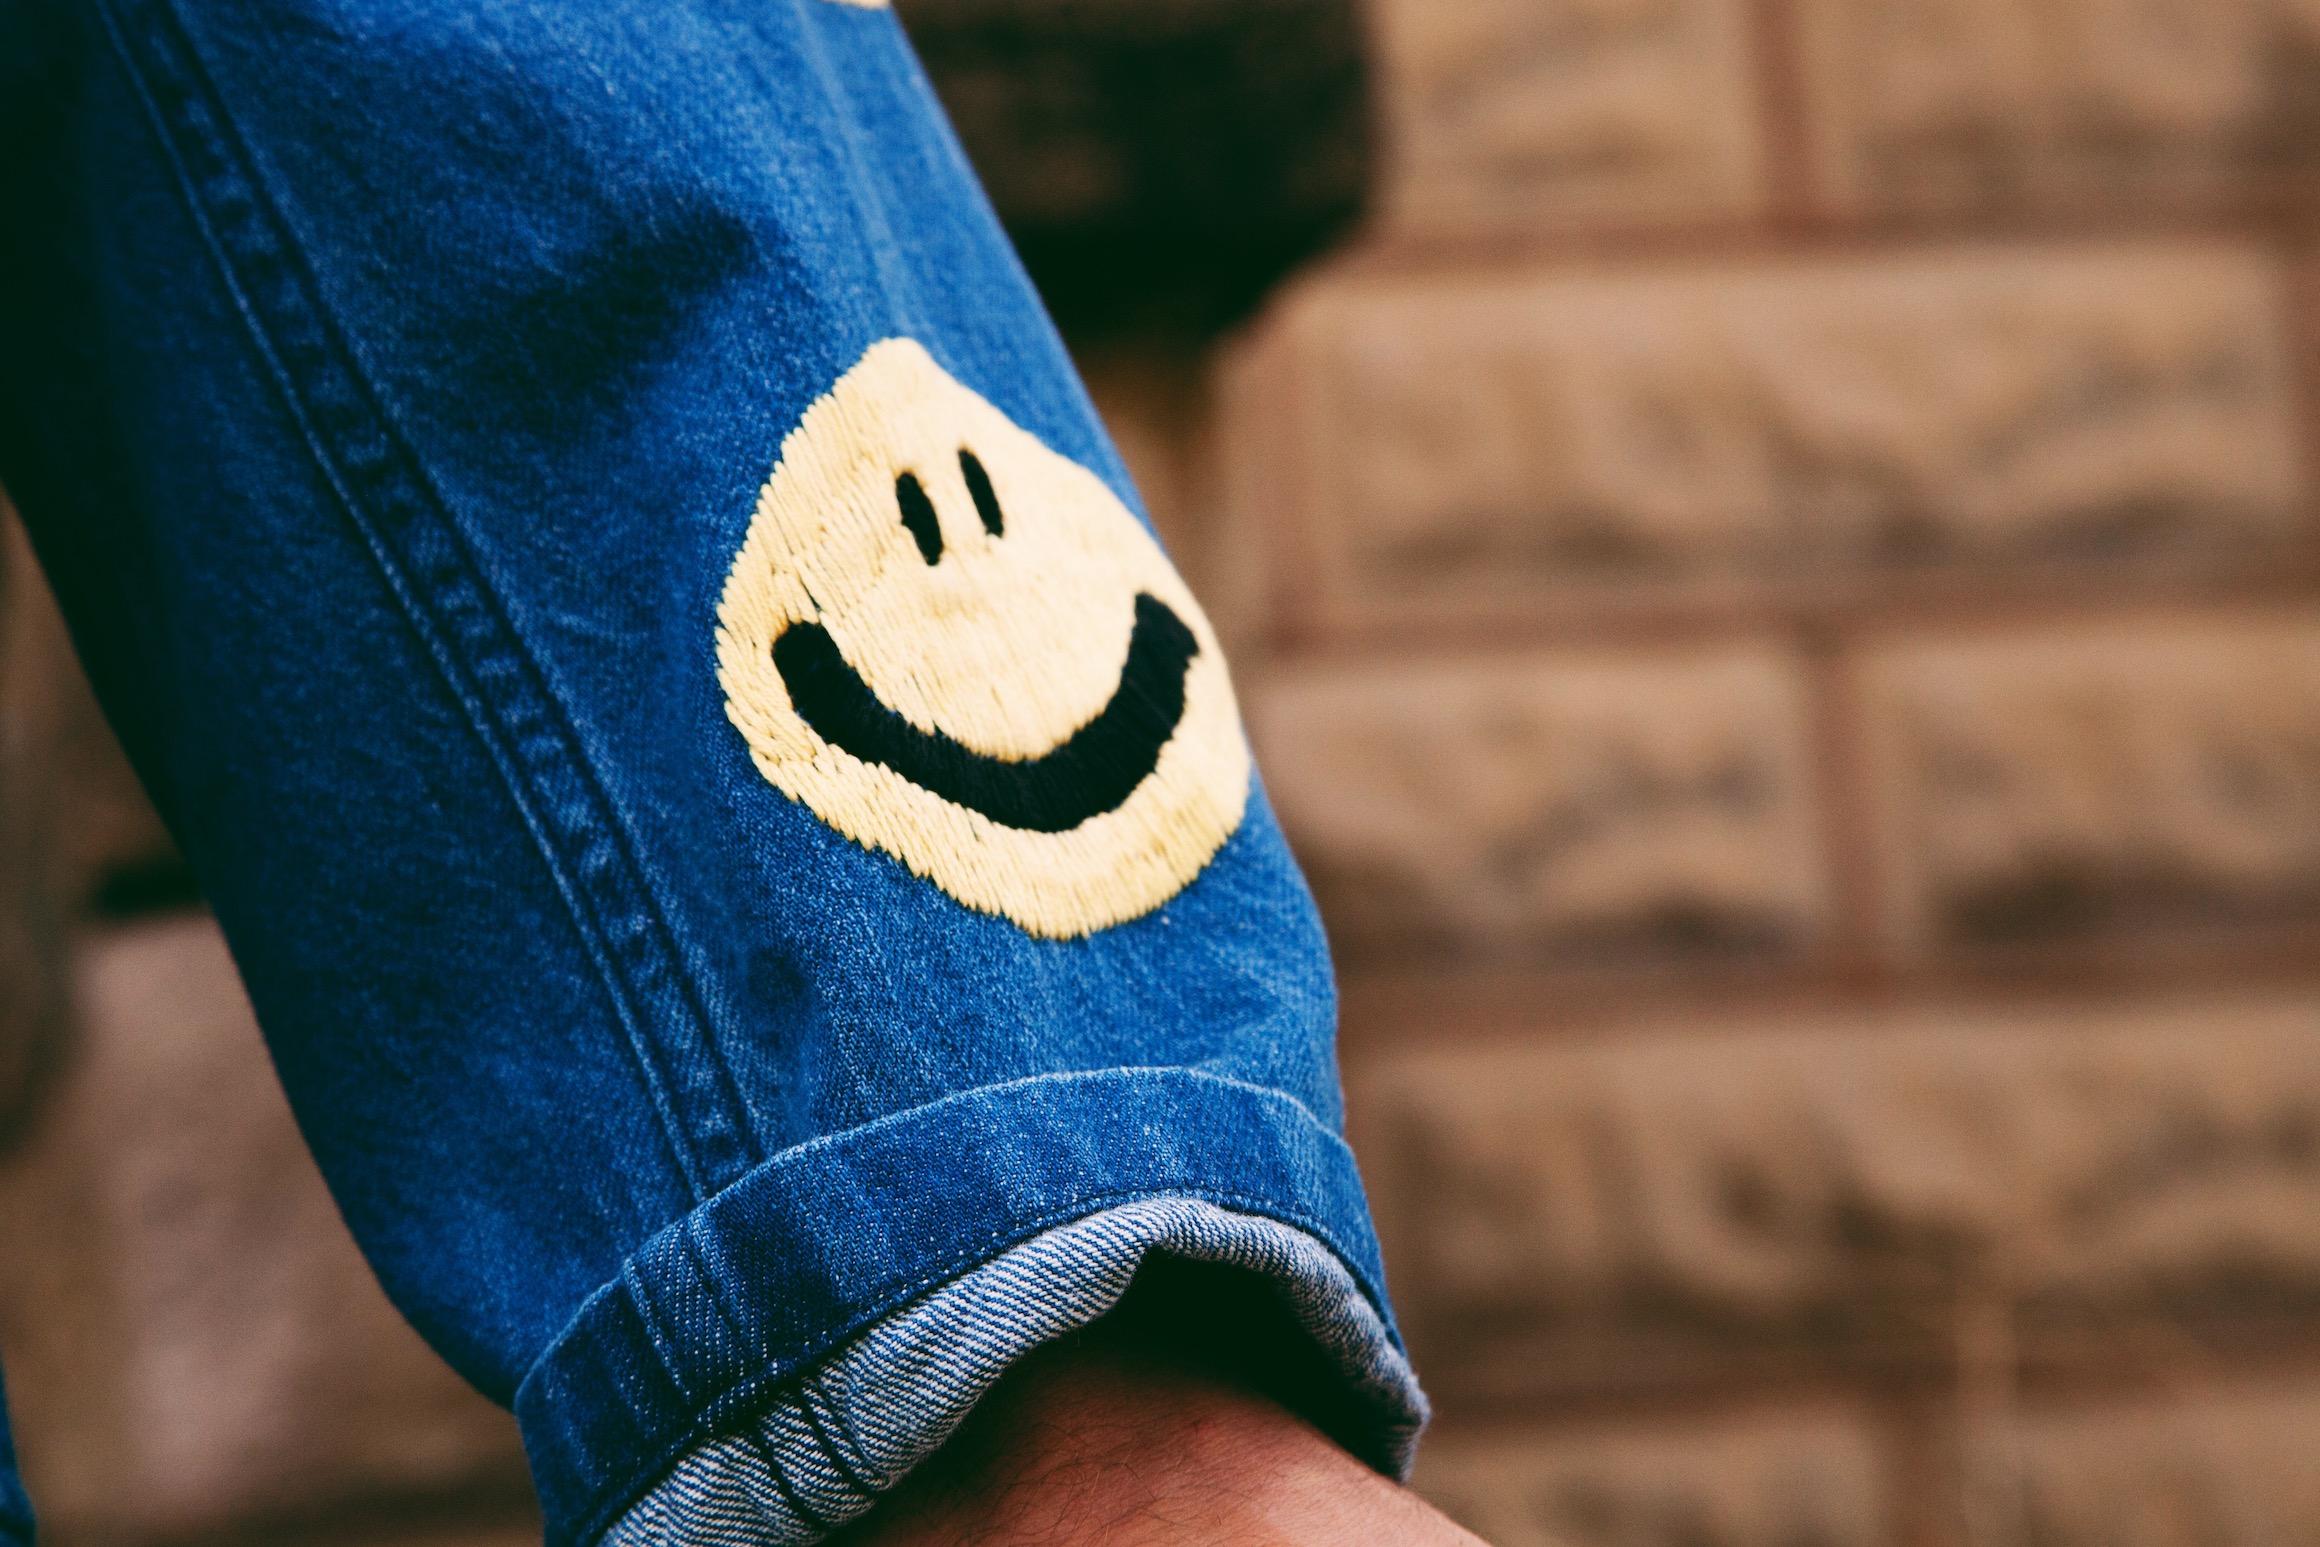 kapital kountry smiley on denim jacket